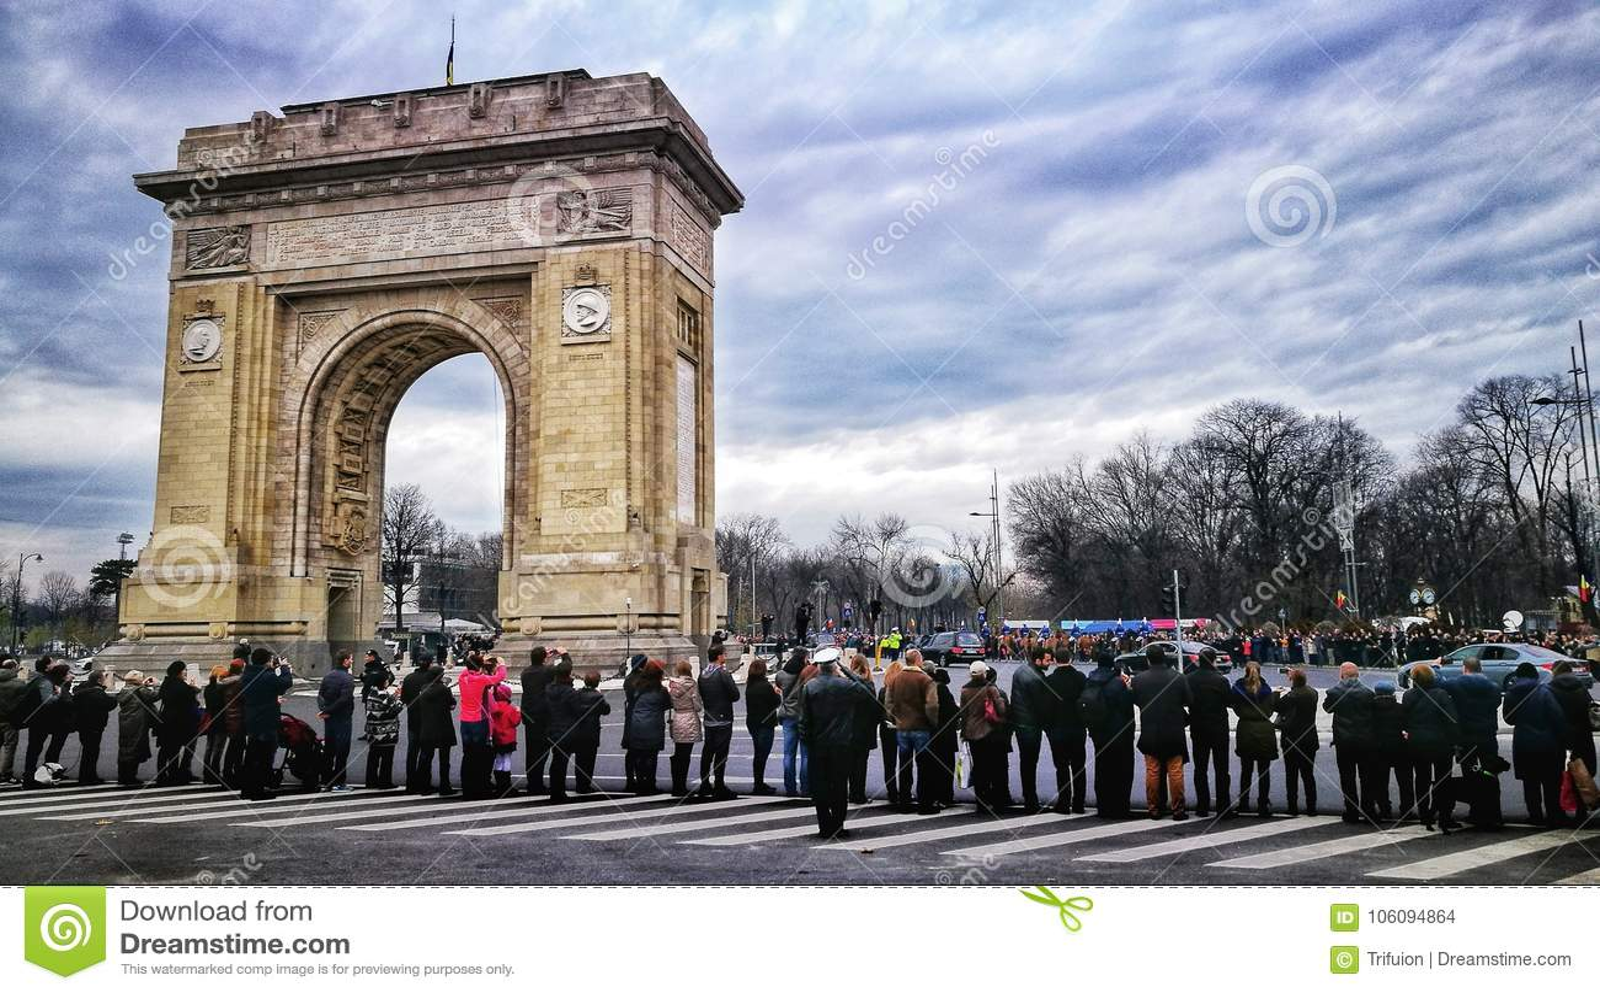 Arch de Triumph布加勒斯特罗马尼亚国王Mihai I Funerals -